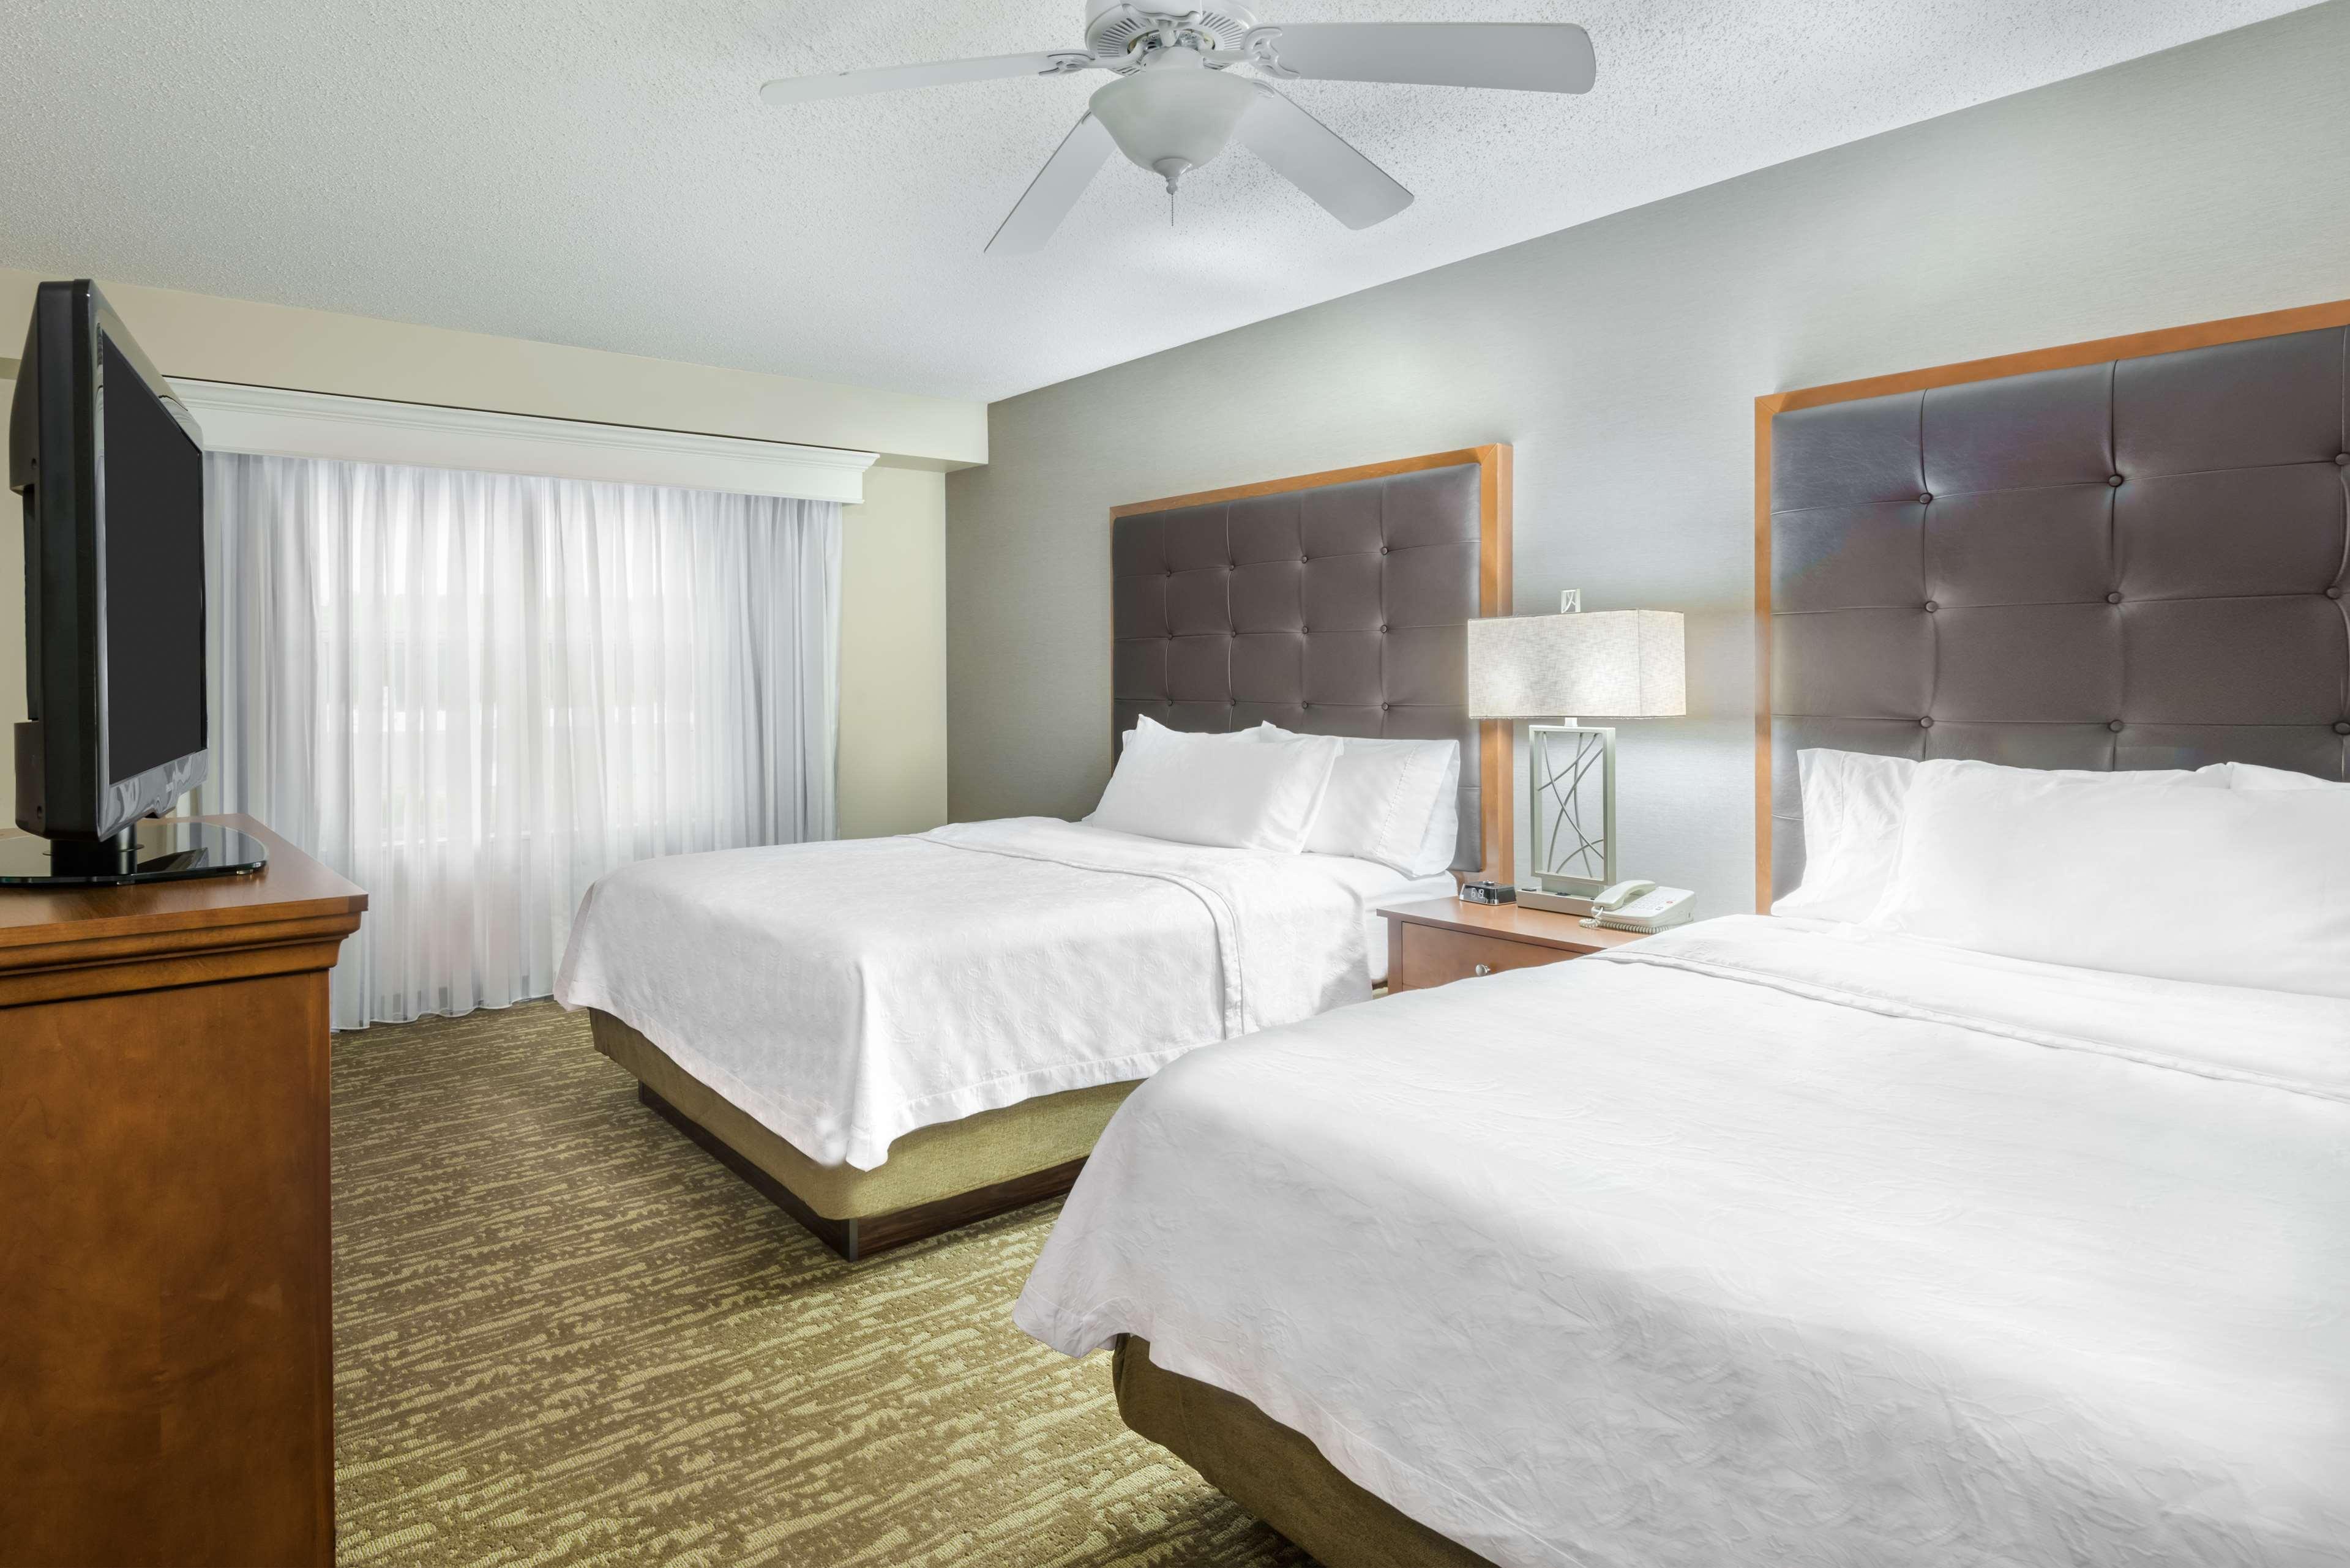 Homewood Suites by Hilton Holyoke-Springfield/North image 22